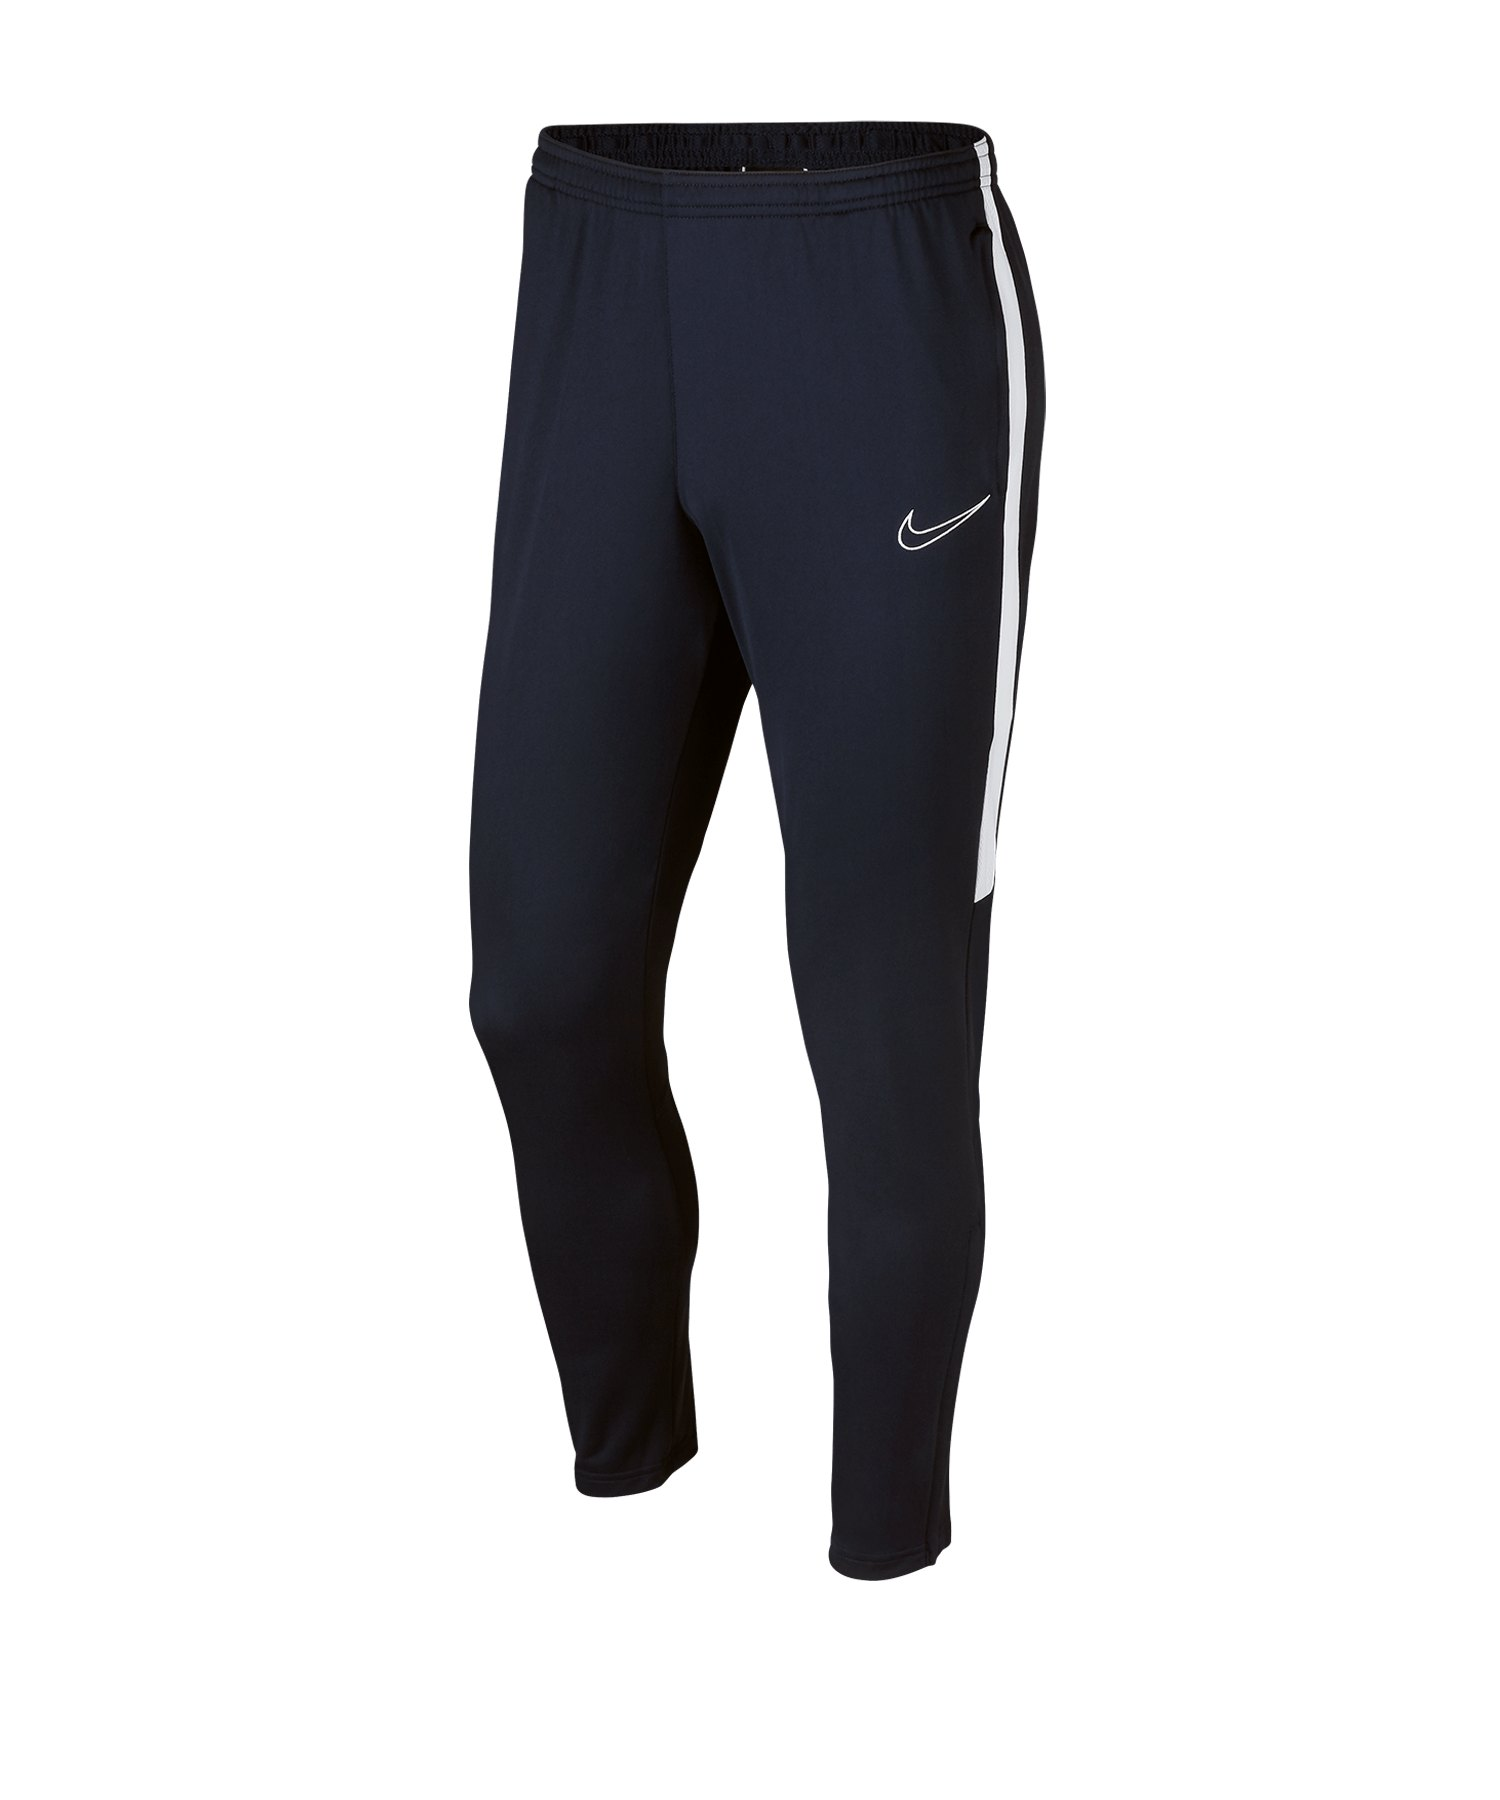 Nike Dry Academy Pant Trainingshose Blau F451 - blau